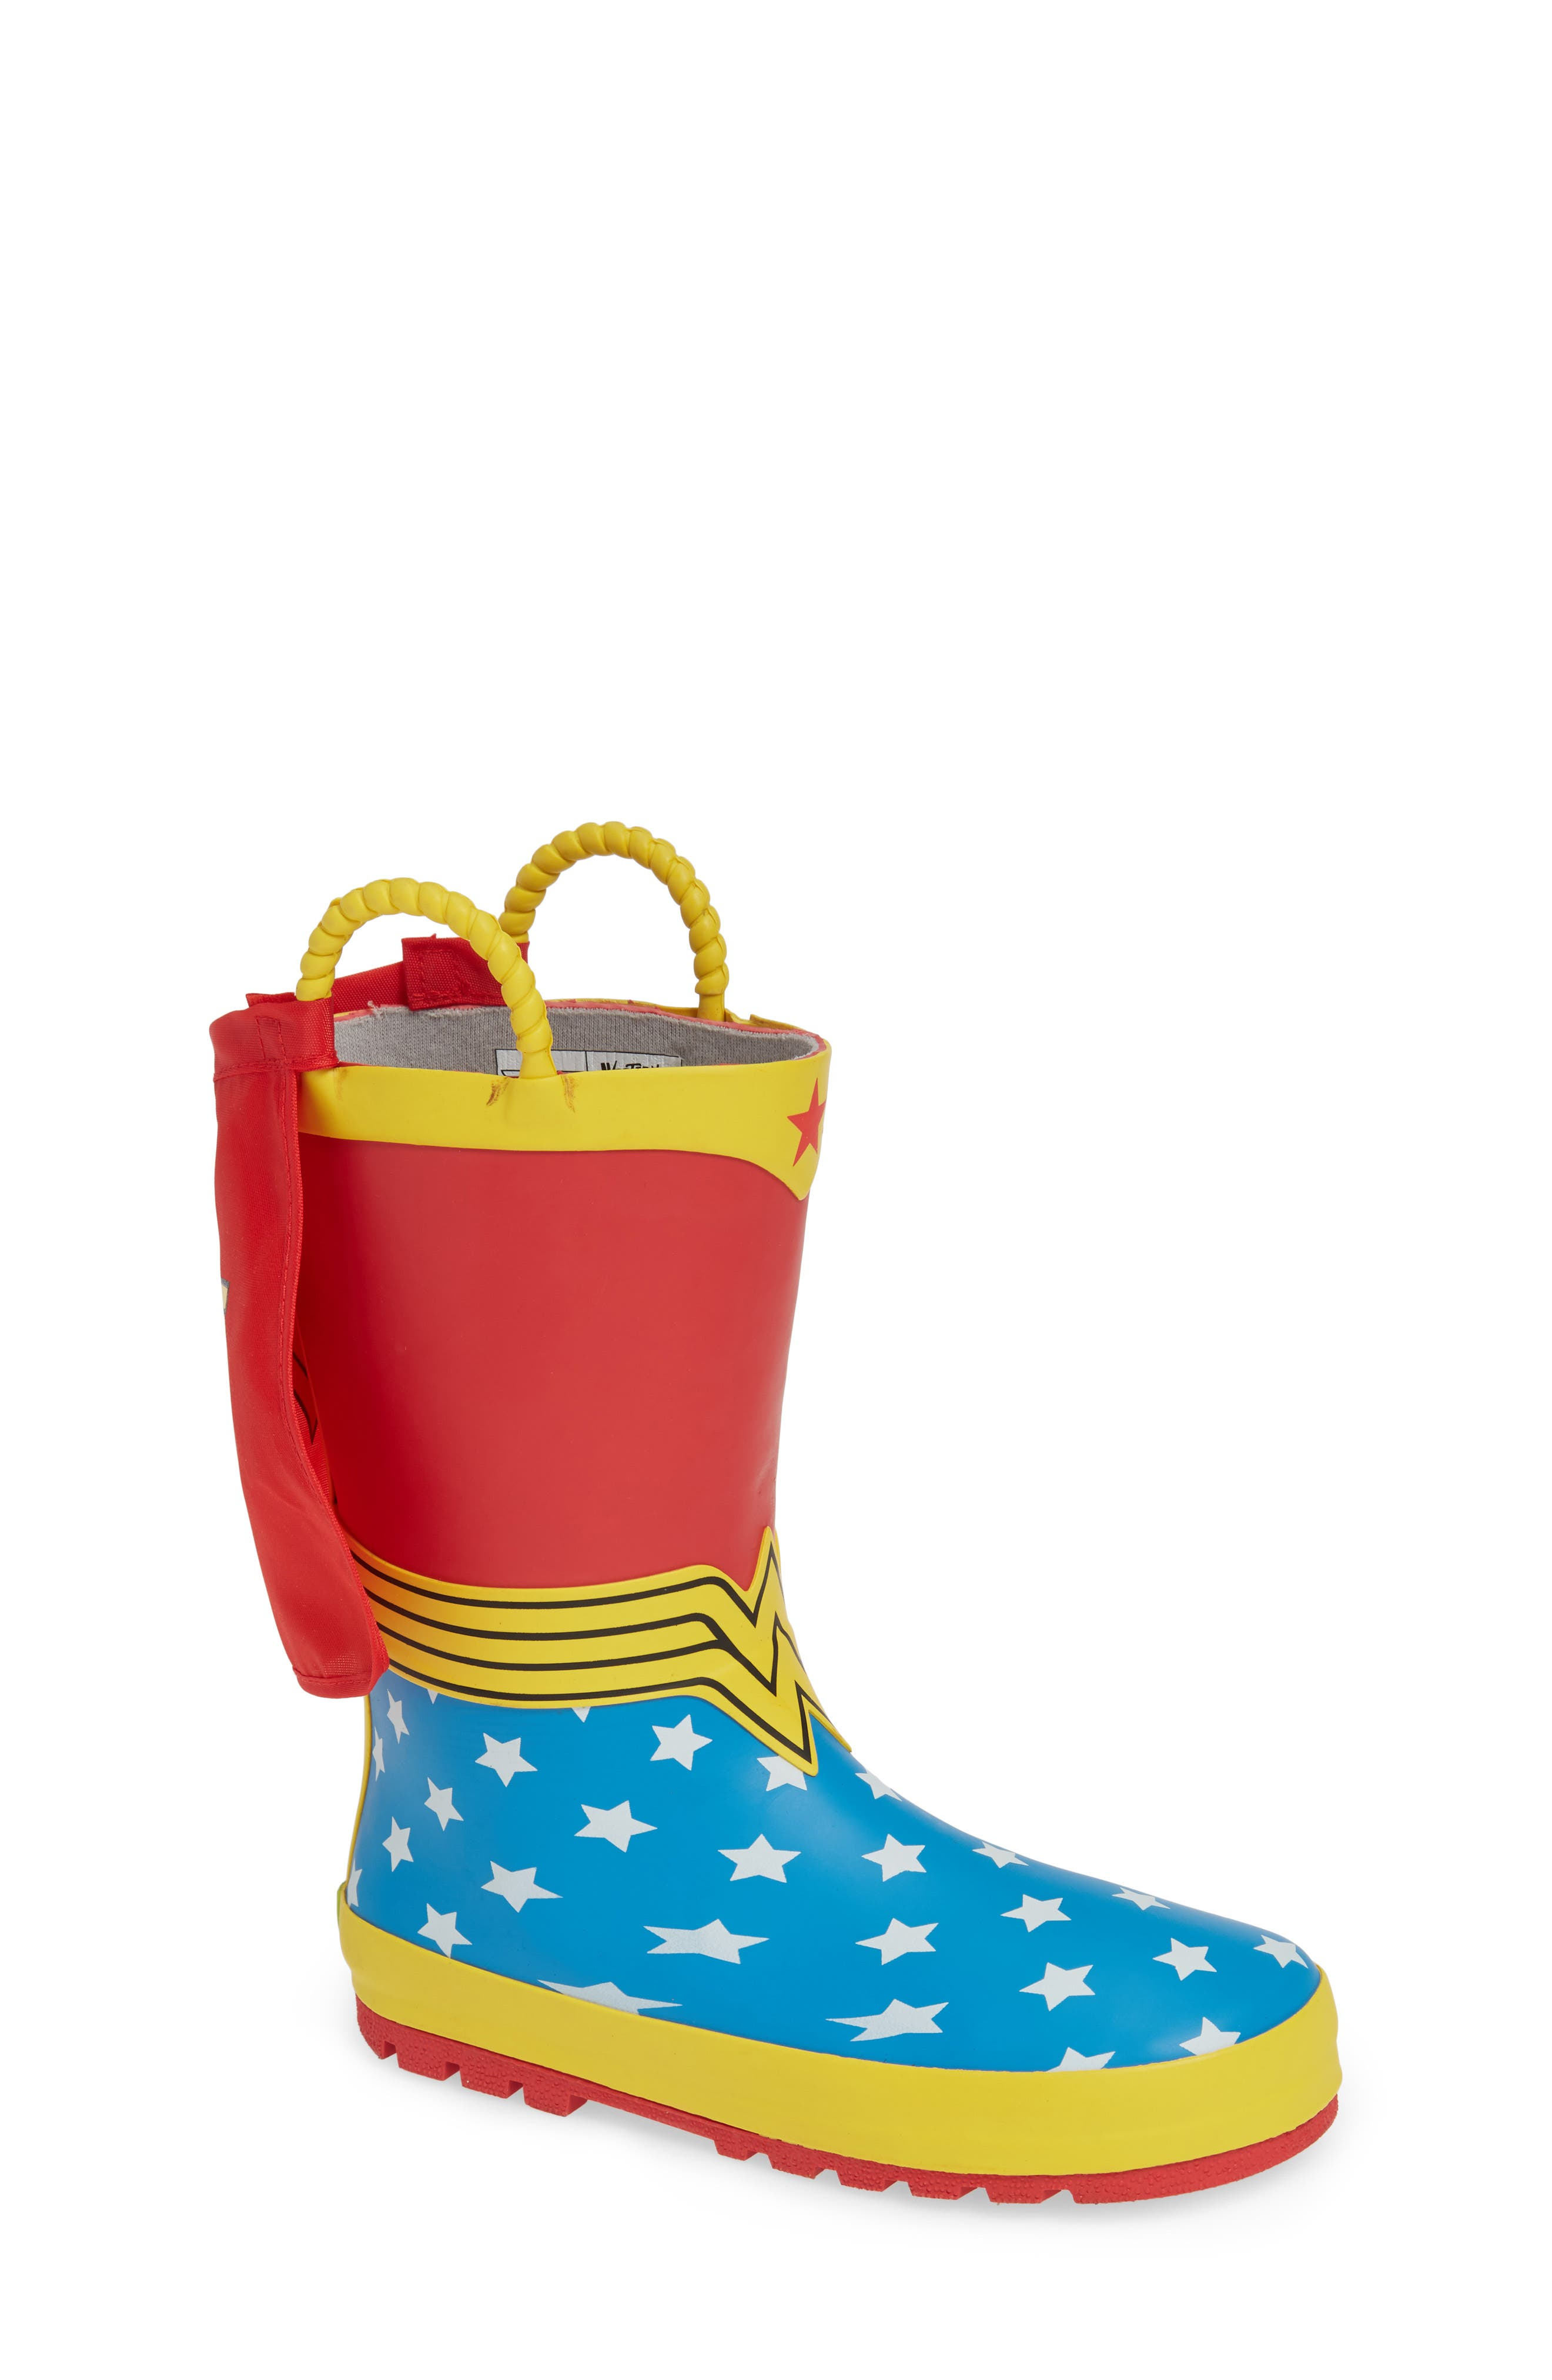 WESTERN CHIEF Wonder Woman Waterproof Rain Boot, Main, color, RED